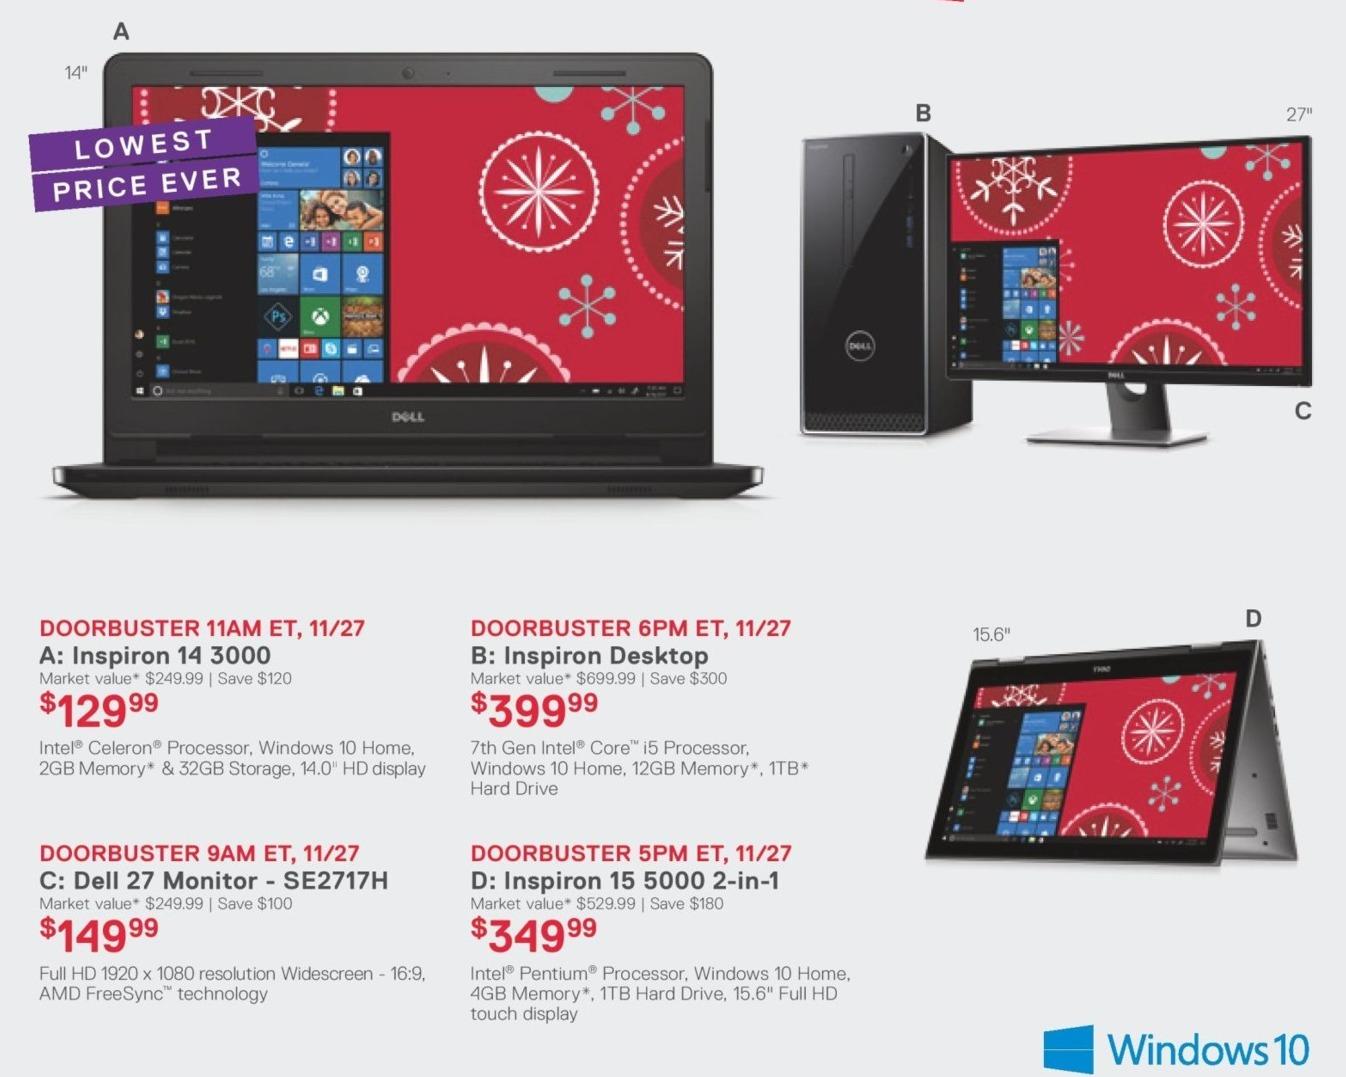 Dell Home & Office Cyber Monday: Dell Inspiron Desktop: i5 (7th Gen), 12GB, 1TB HD, Win 10 Home for $399.99